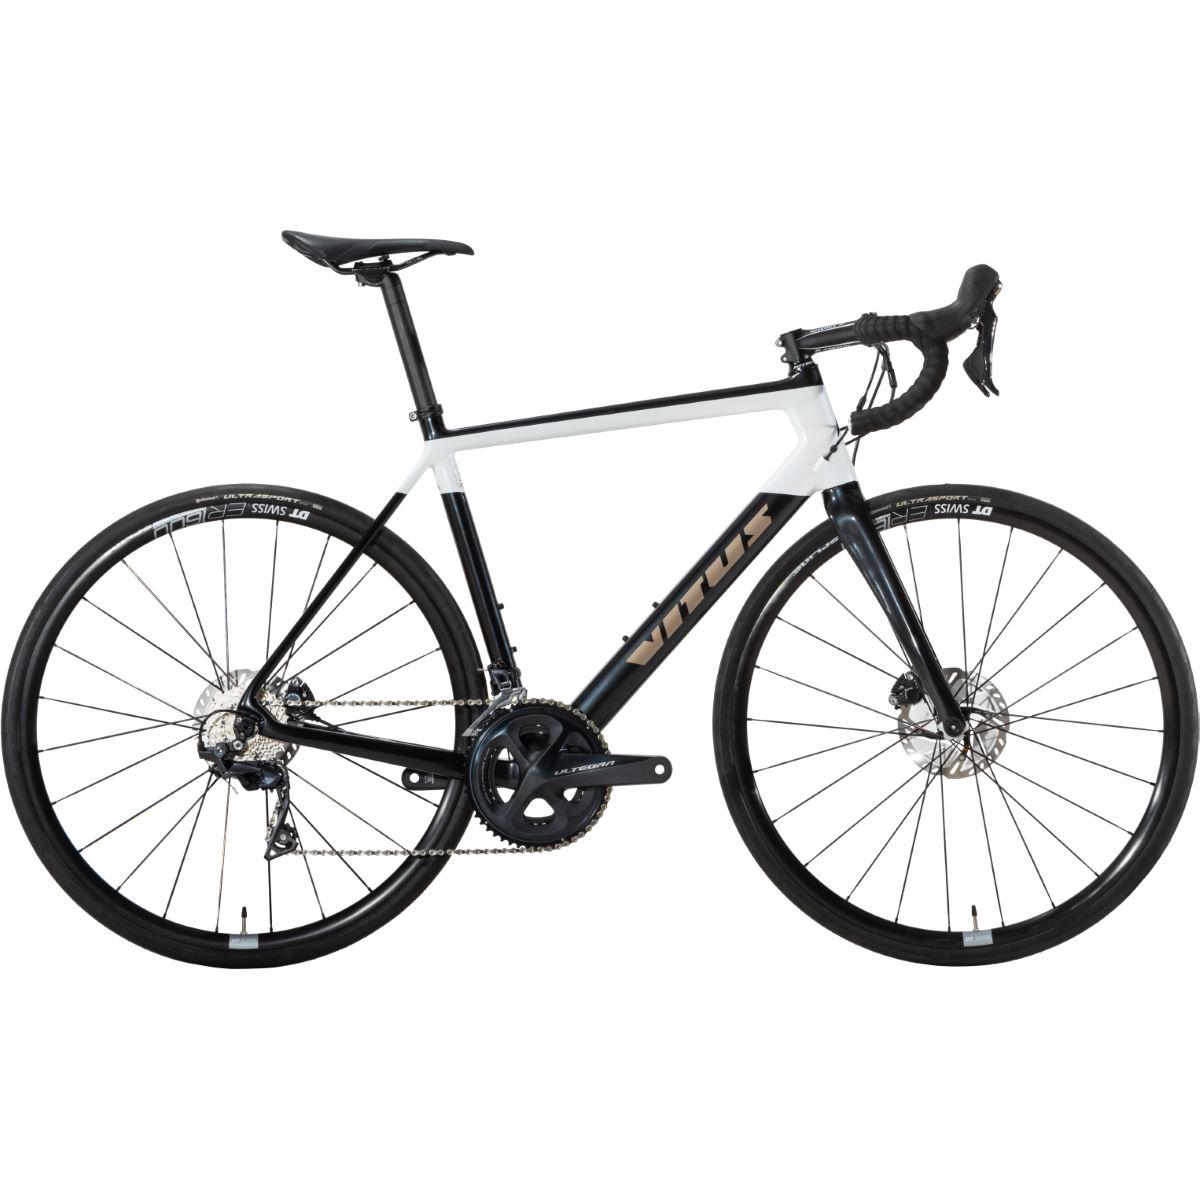 Vitus Venon Disc CRS Ultegra 2019 Bikes